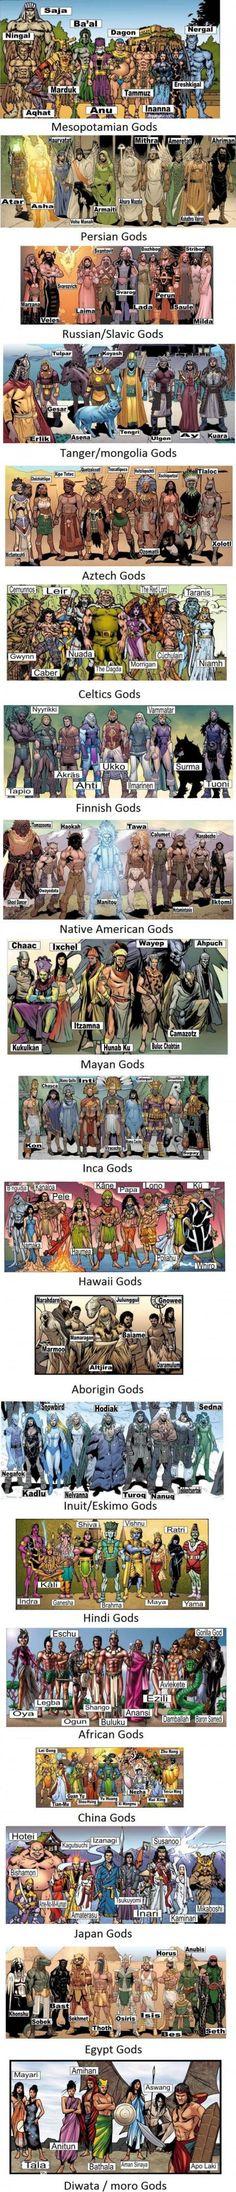 Gods assemble